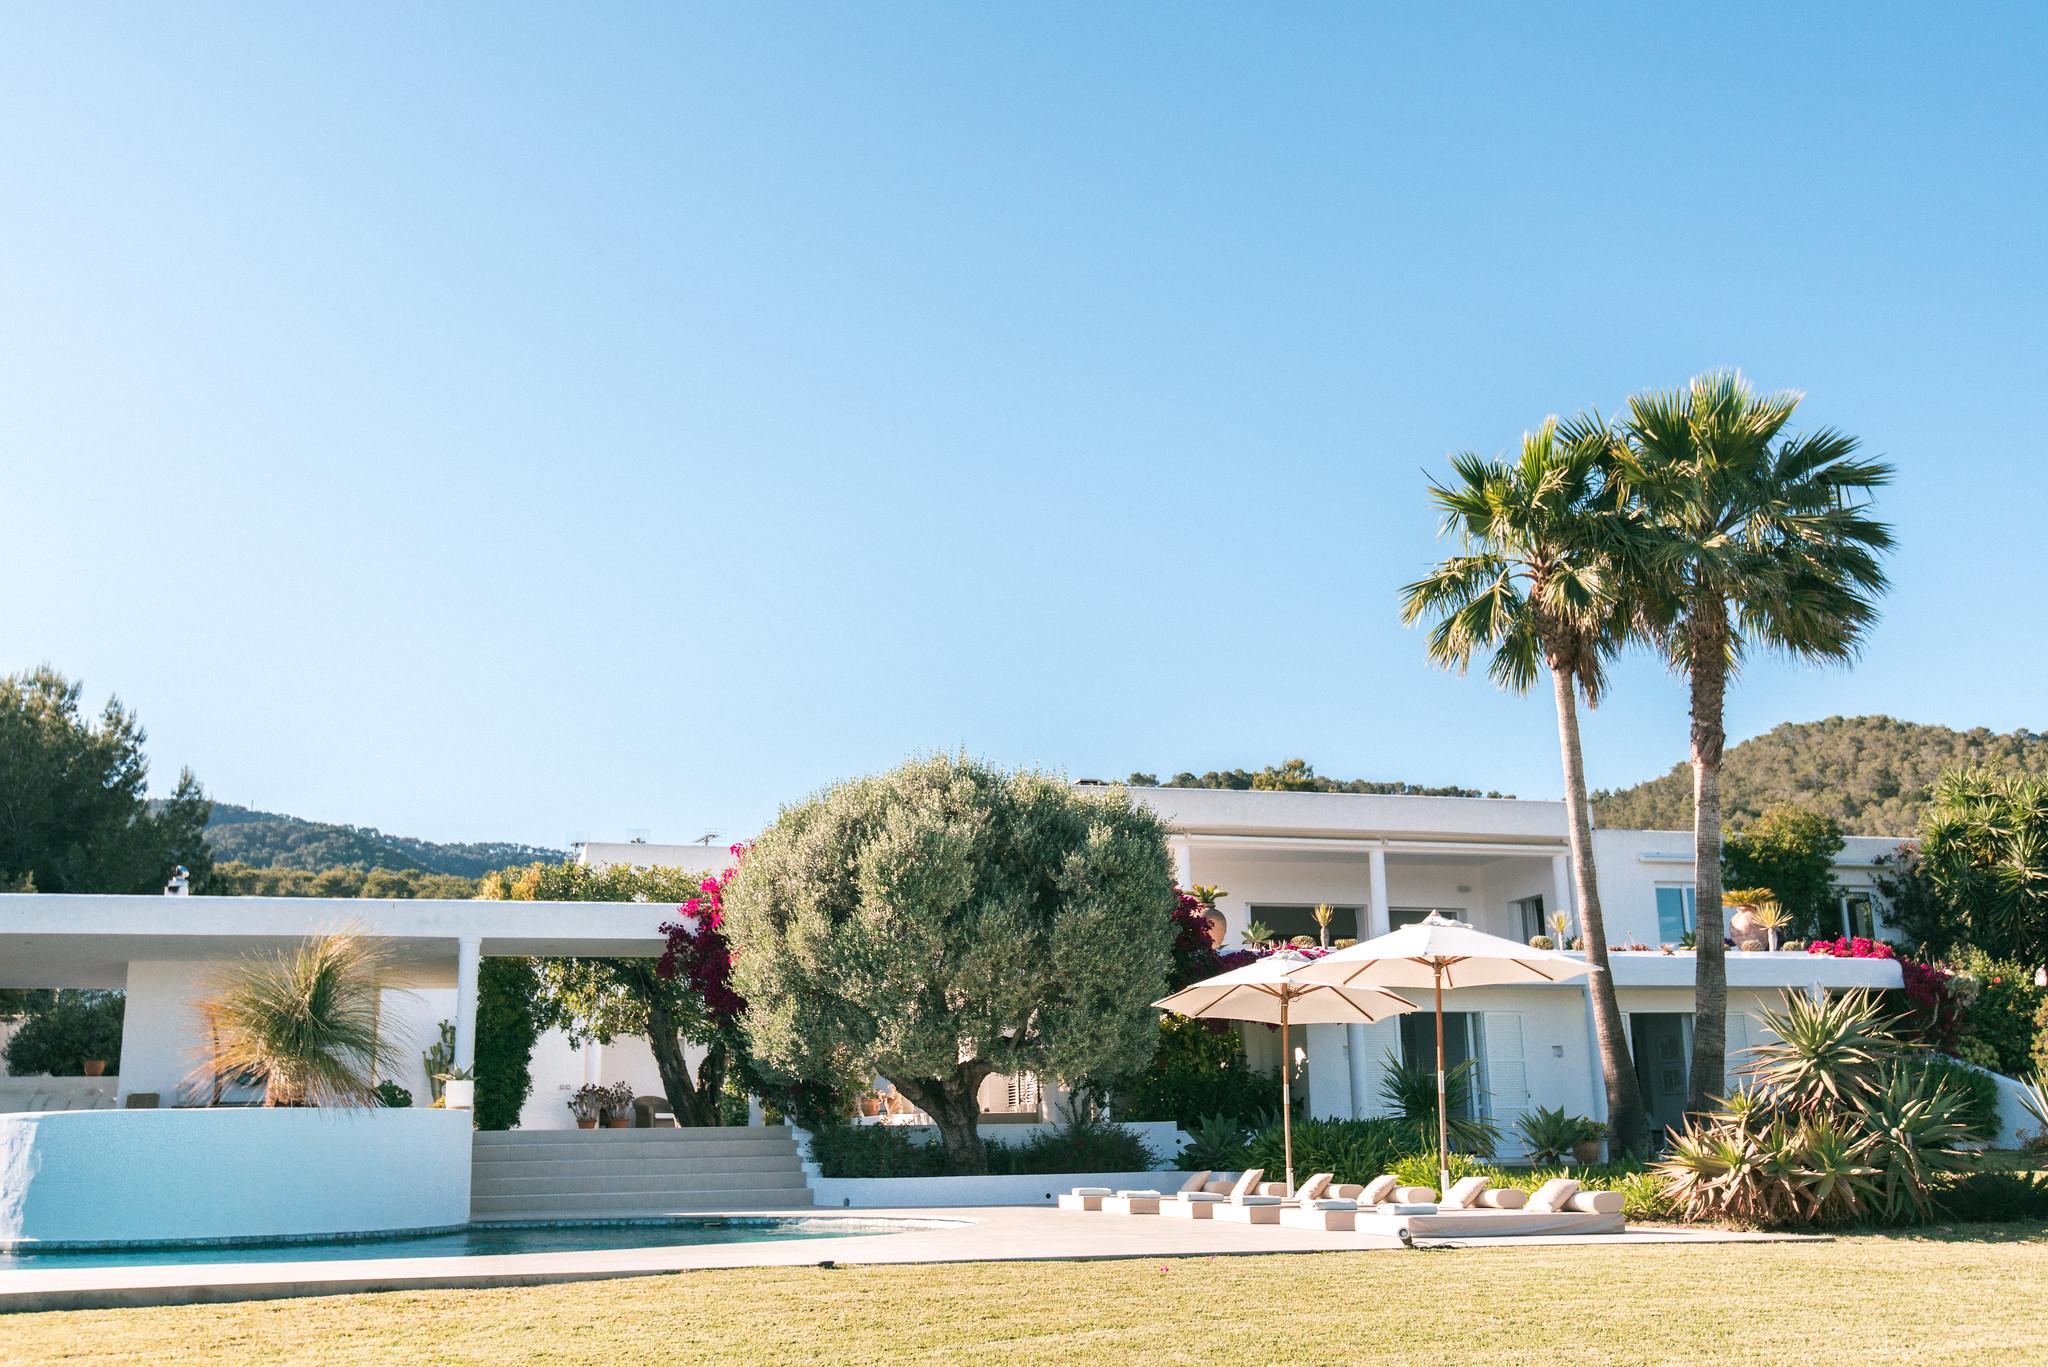 https://www.white-ibiza.com/wp-content/uploads/2020/06/white-ibiza-villas-casa-odette-exterior-view-back-to-house.jpg